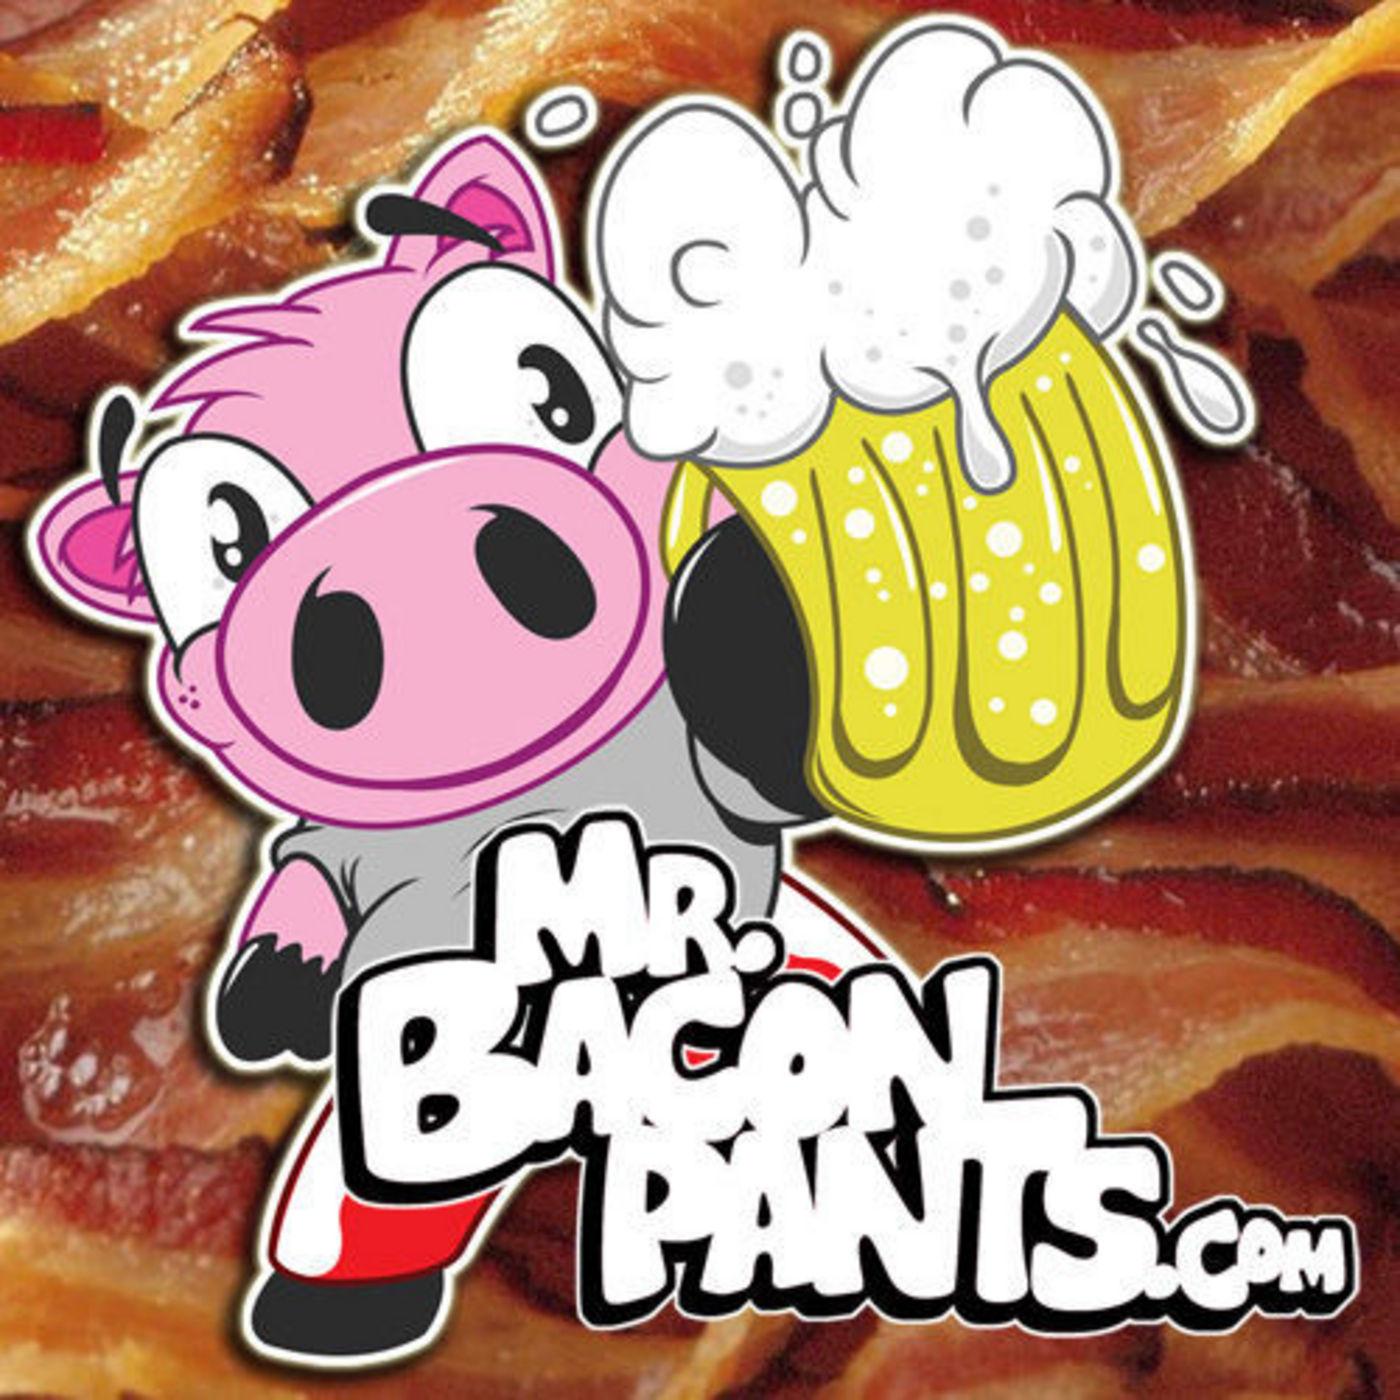 <![CDATA[Mr. Baconpants' Bacon LIVE]]>